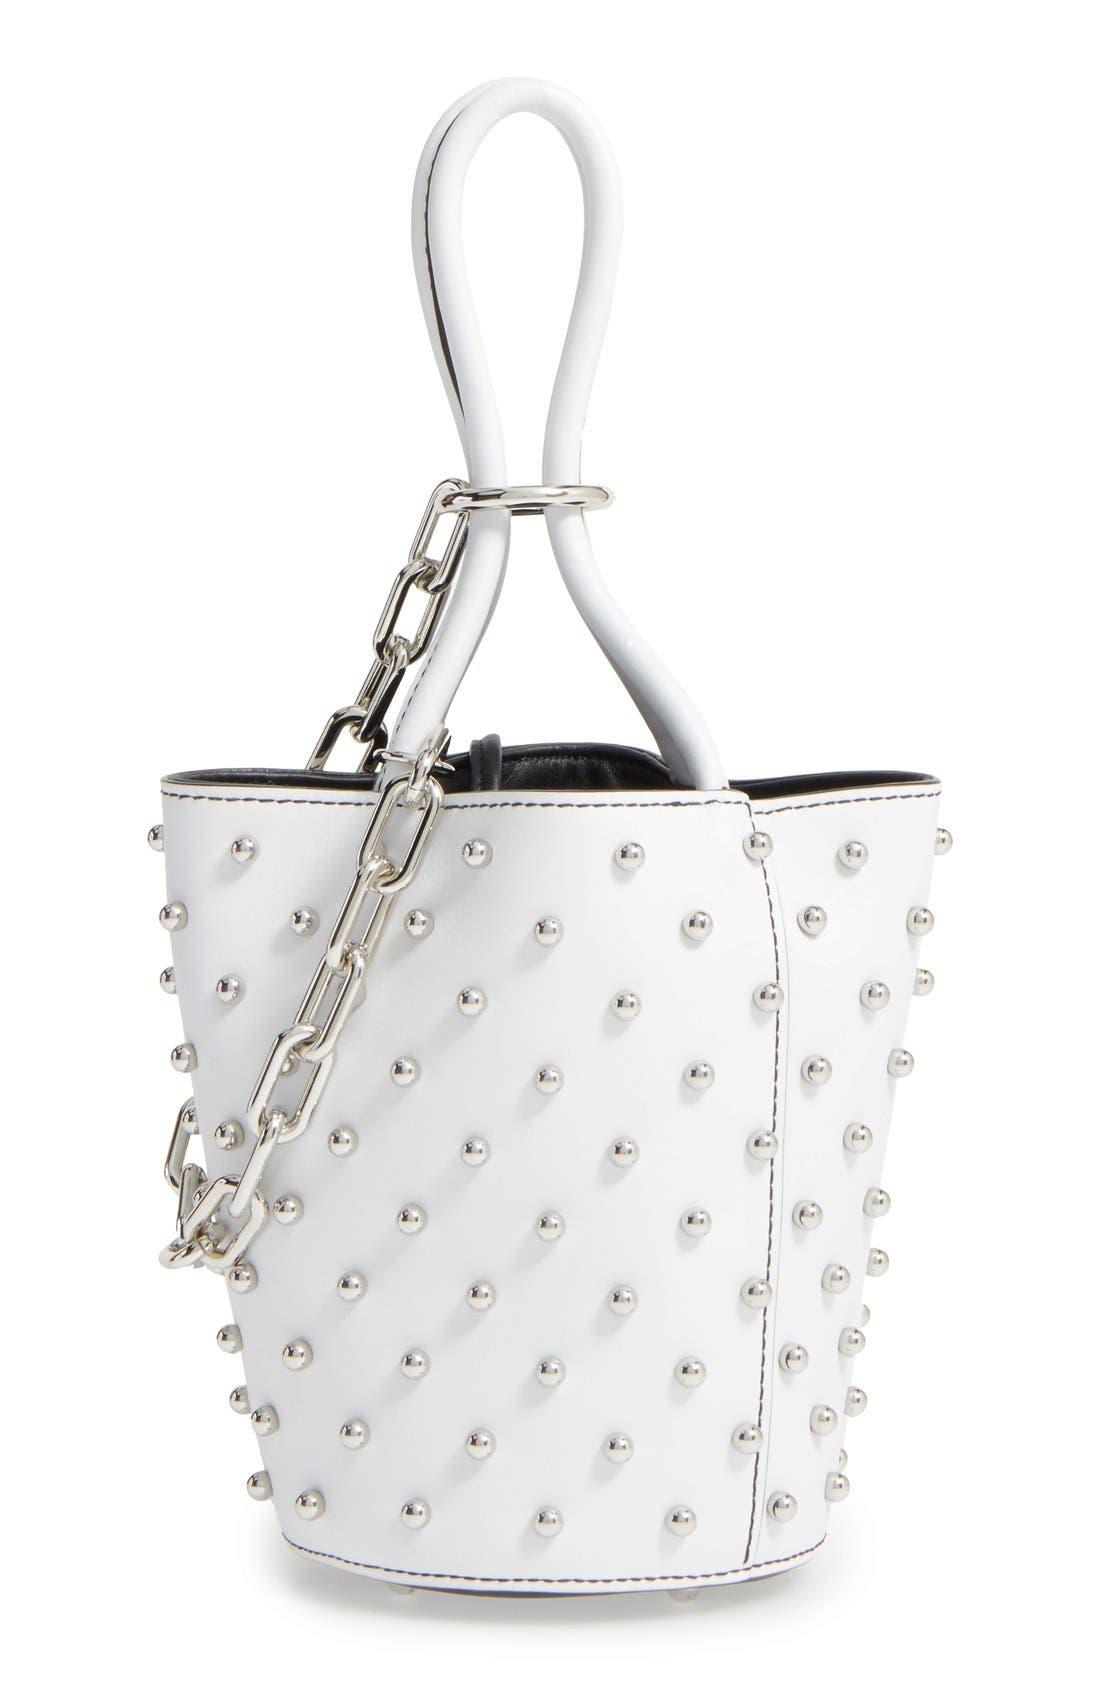 Alternate Image 1 Selected - Alexander Wang Mini Palladium Leather Bucket Bag